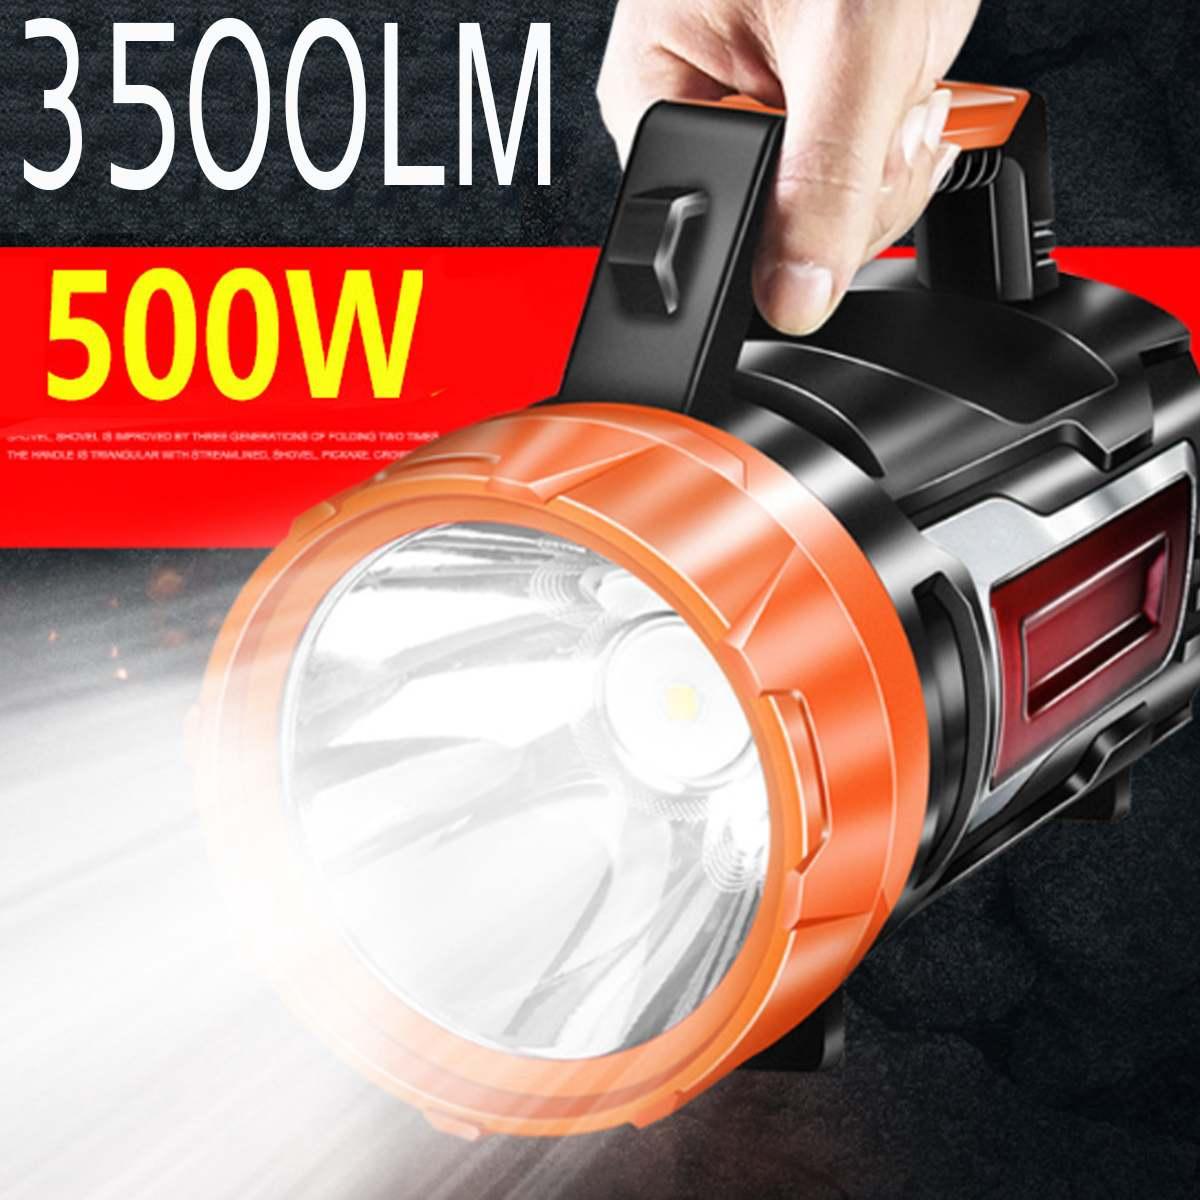 500W USB Charging LED Work Light Torch 10000mAh Battery Spotlight Hand Lamp Camping Lantern Searchlight for Hiking Hunting